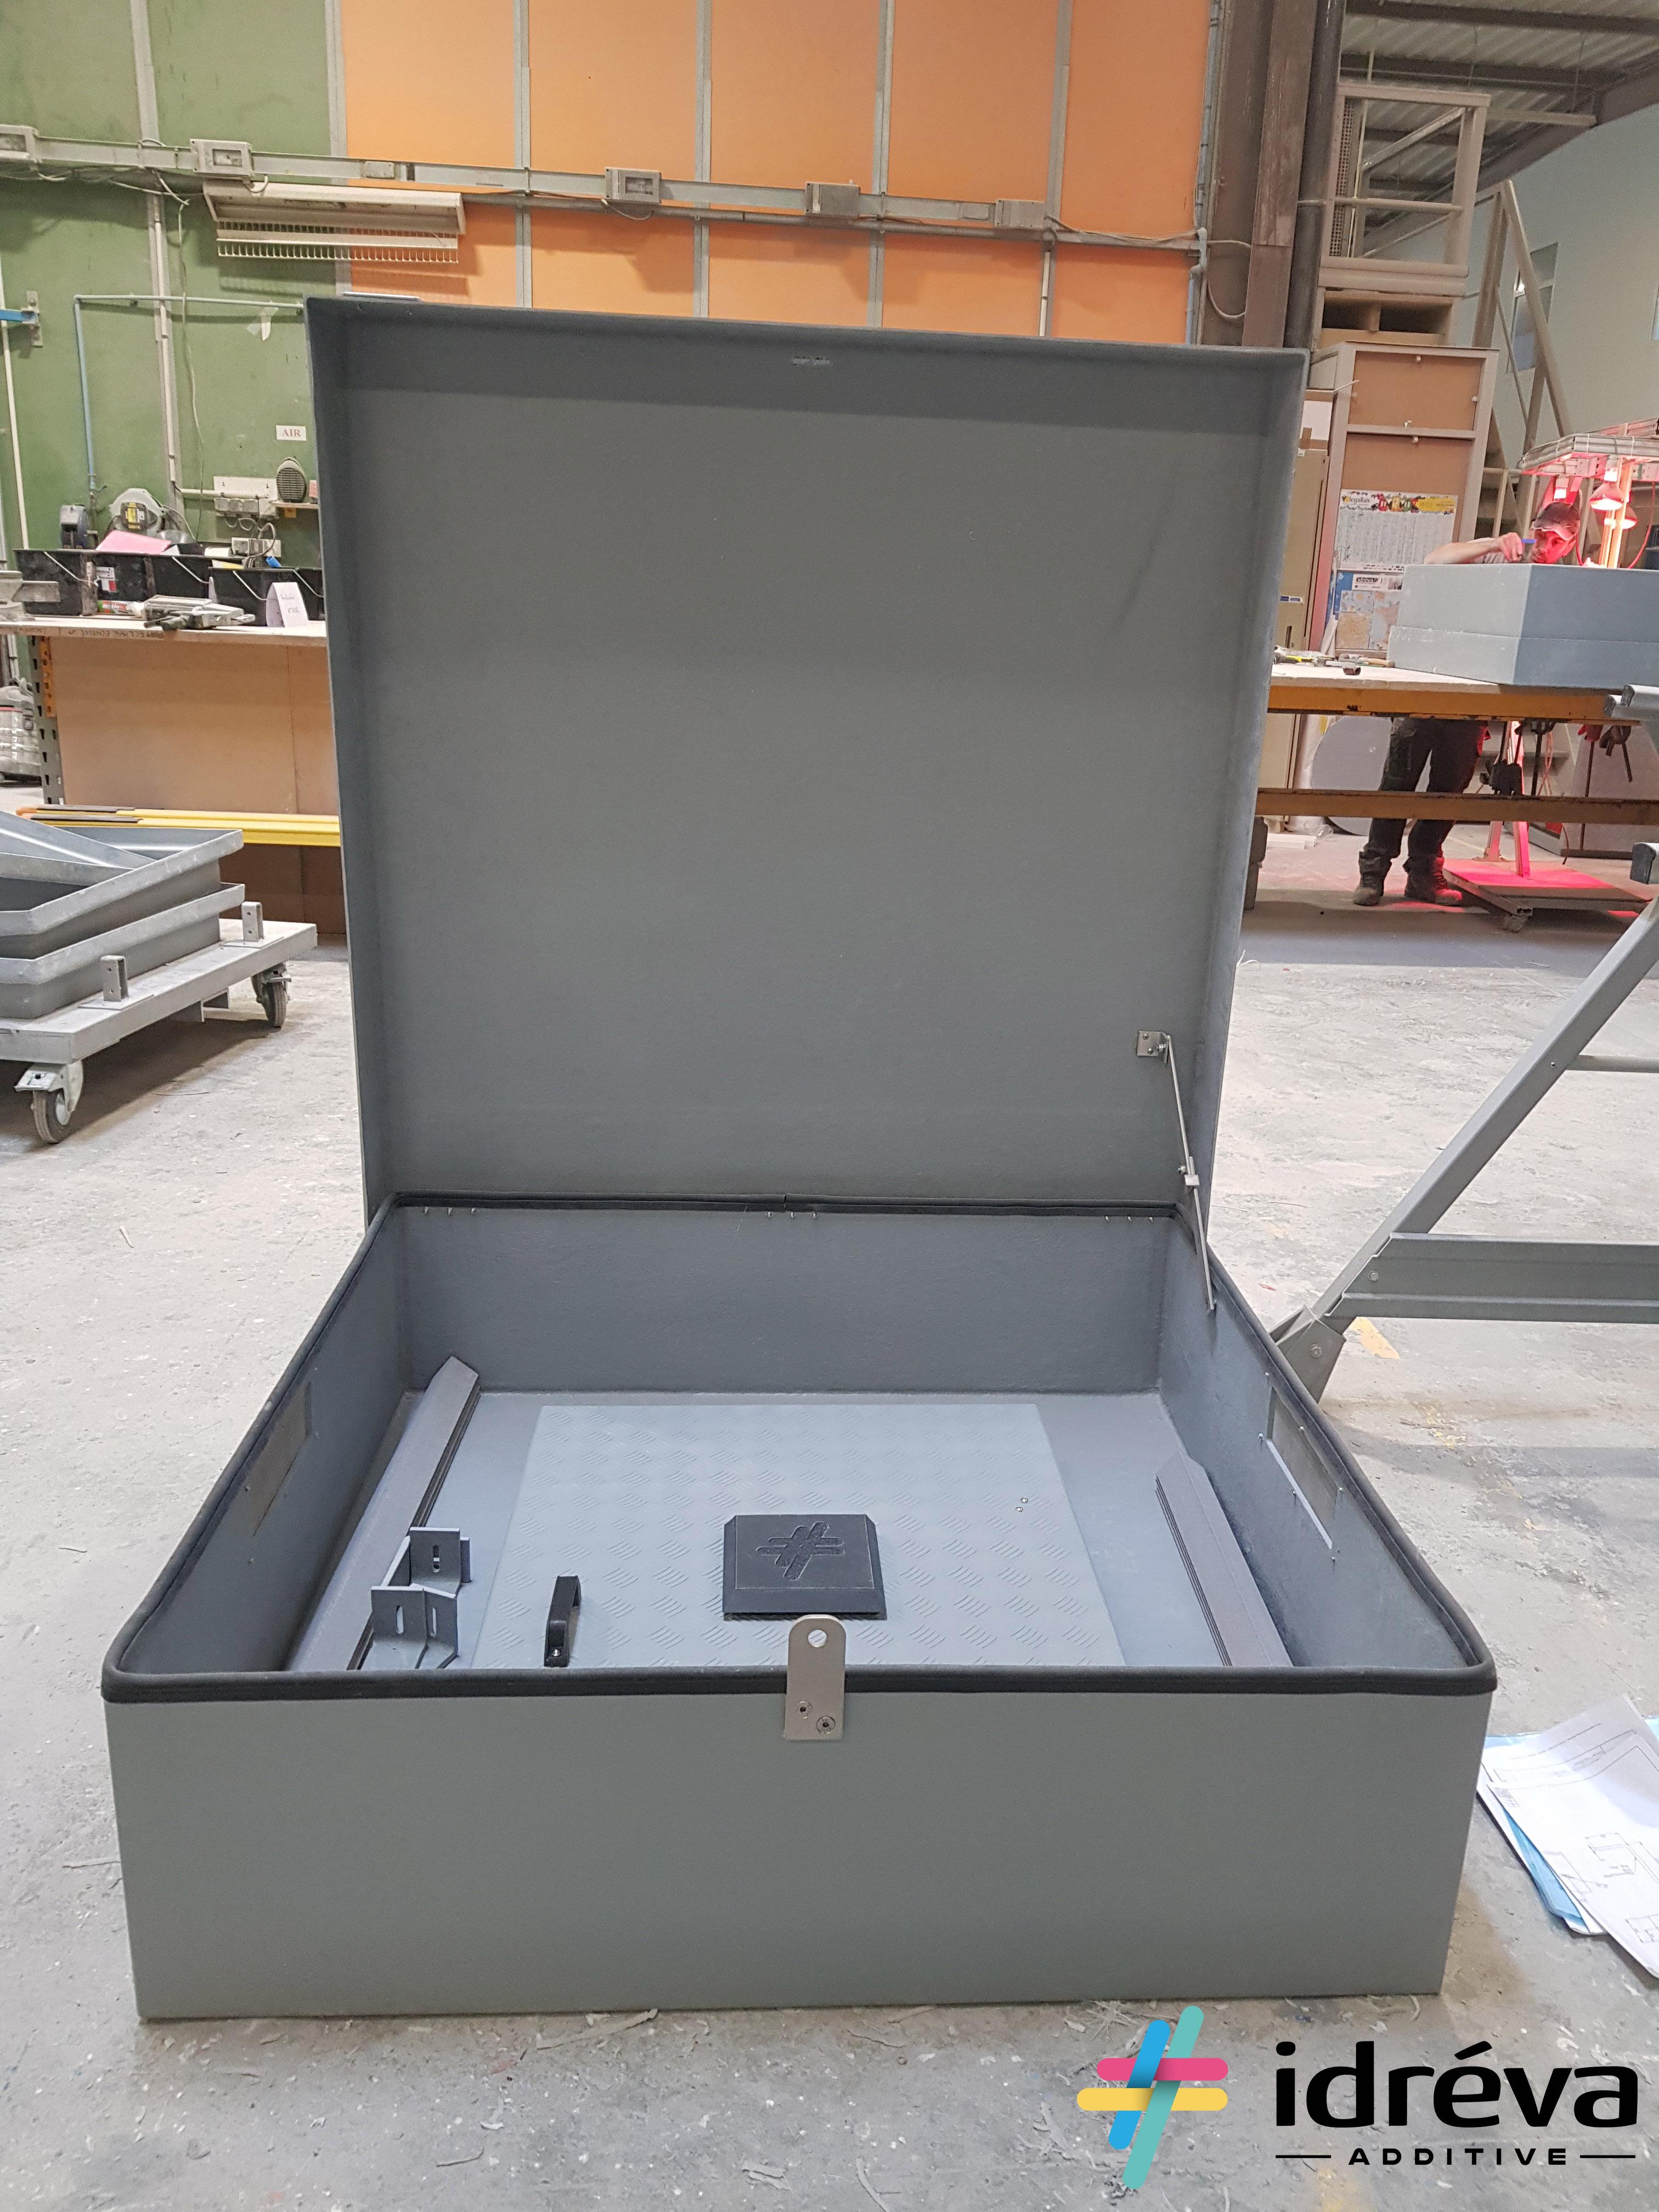 Accessoire Idreva Impression 3D